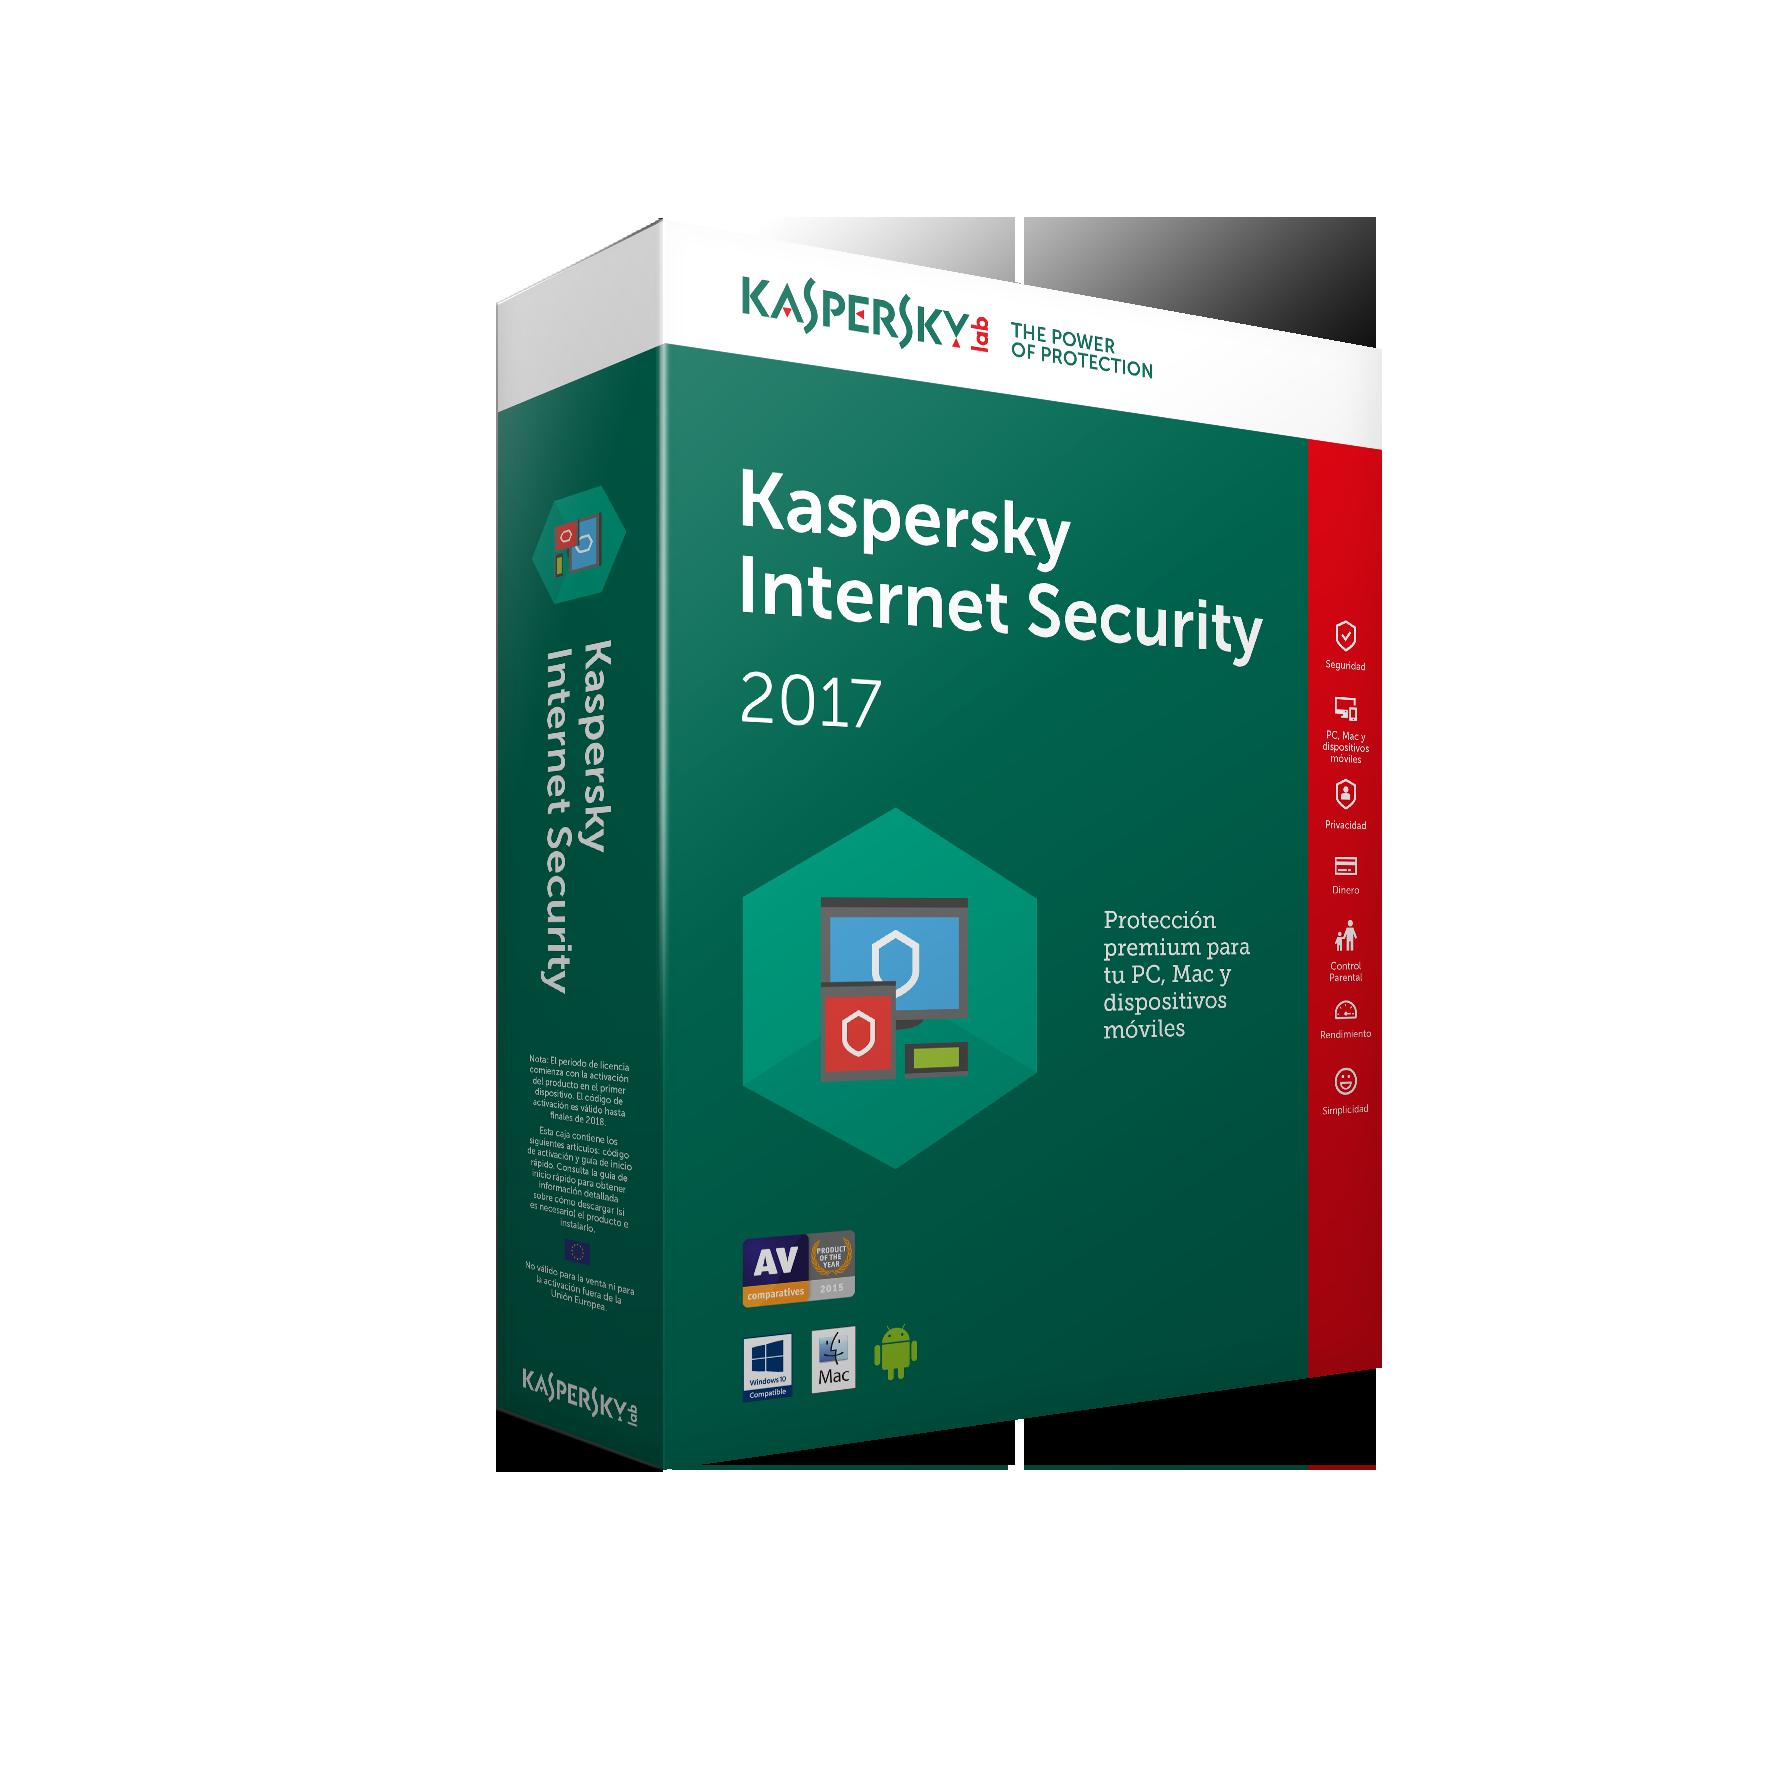 KL1941SBAFS-7 - ANTIVIRUS KASPERSKY 2017 1 US INTERNET SECURITY